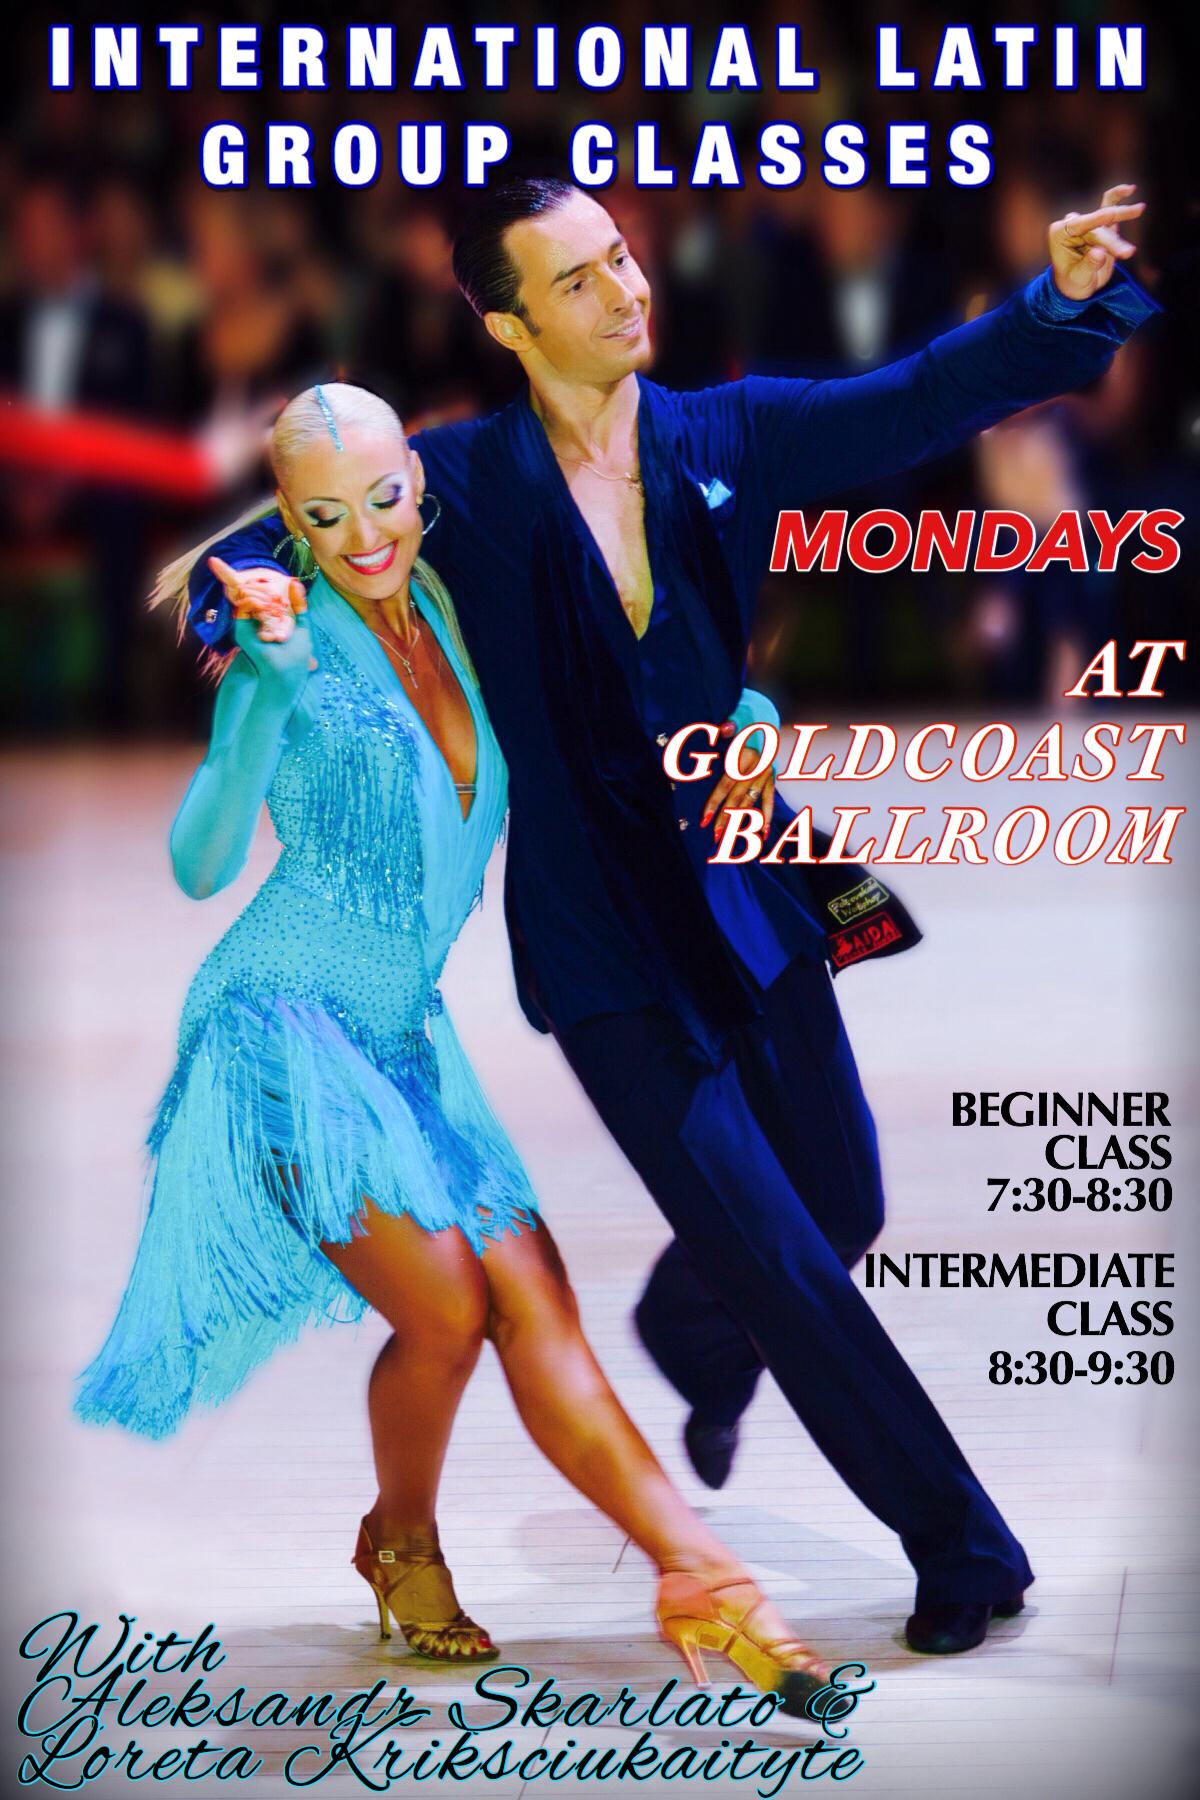 International Champions Aleksandr Skarlato & Loreta Kriksciukaityte - Teach International Latin Classes Monday Evenings at Goldcoast Ballroom!!